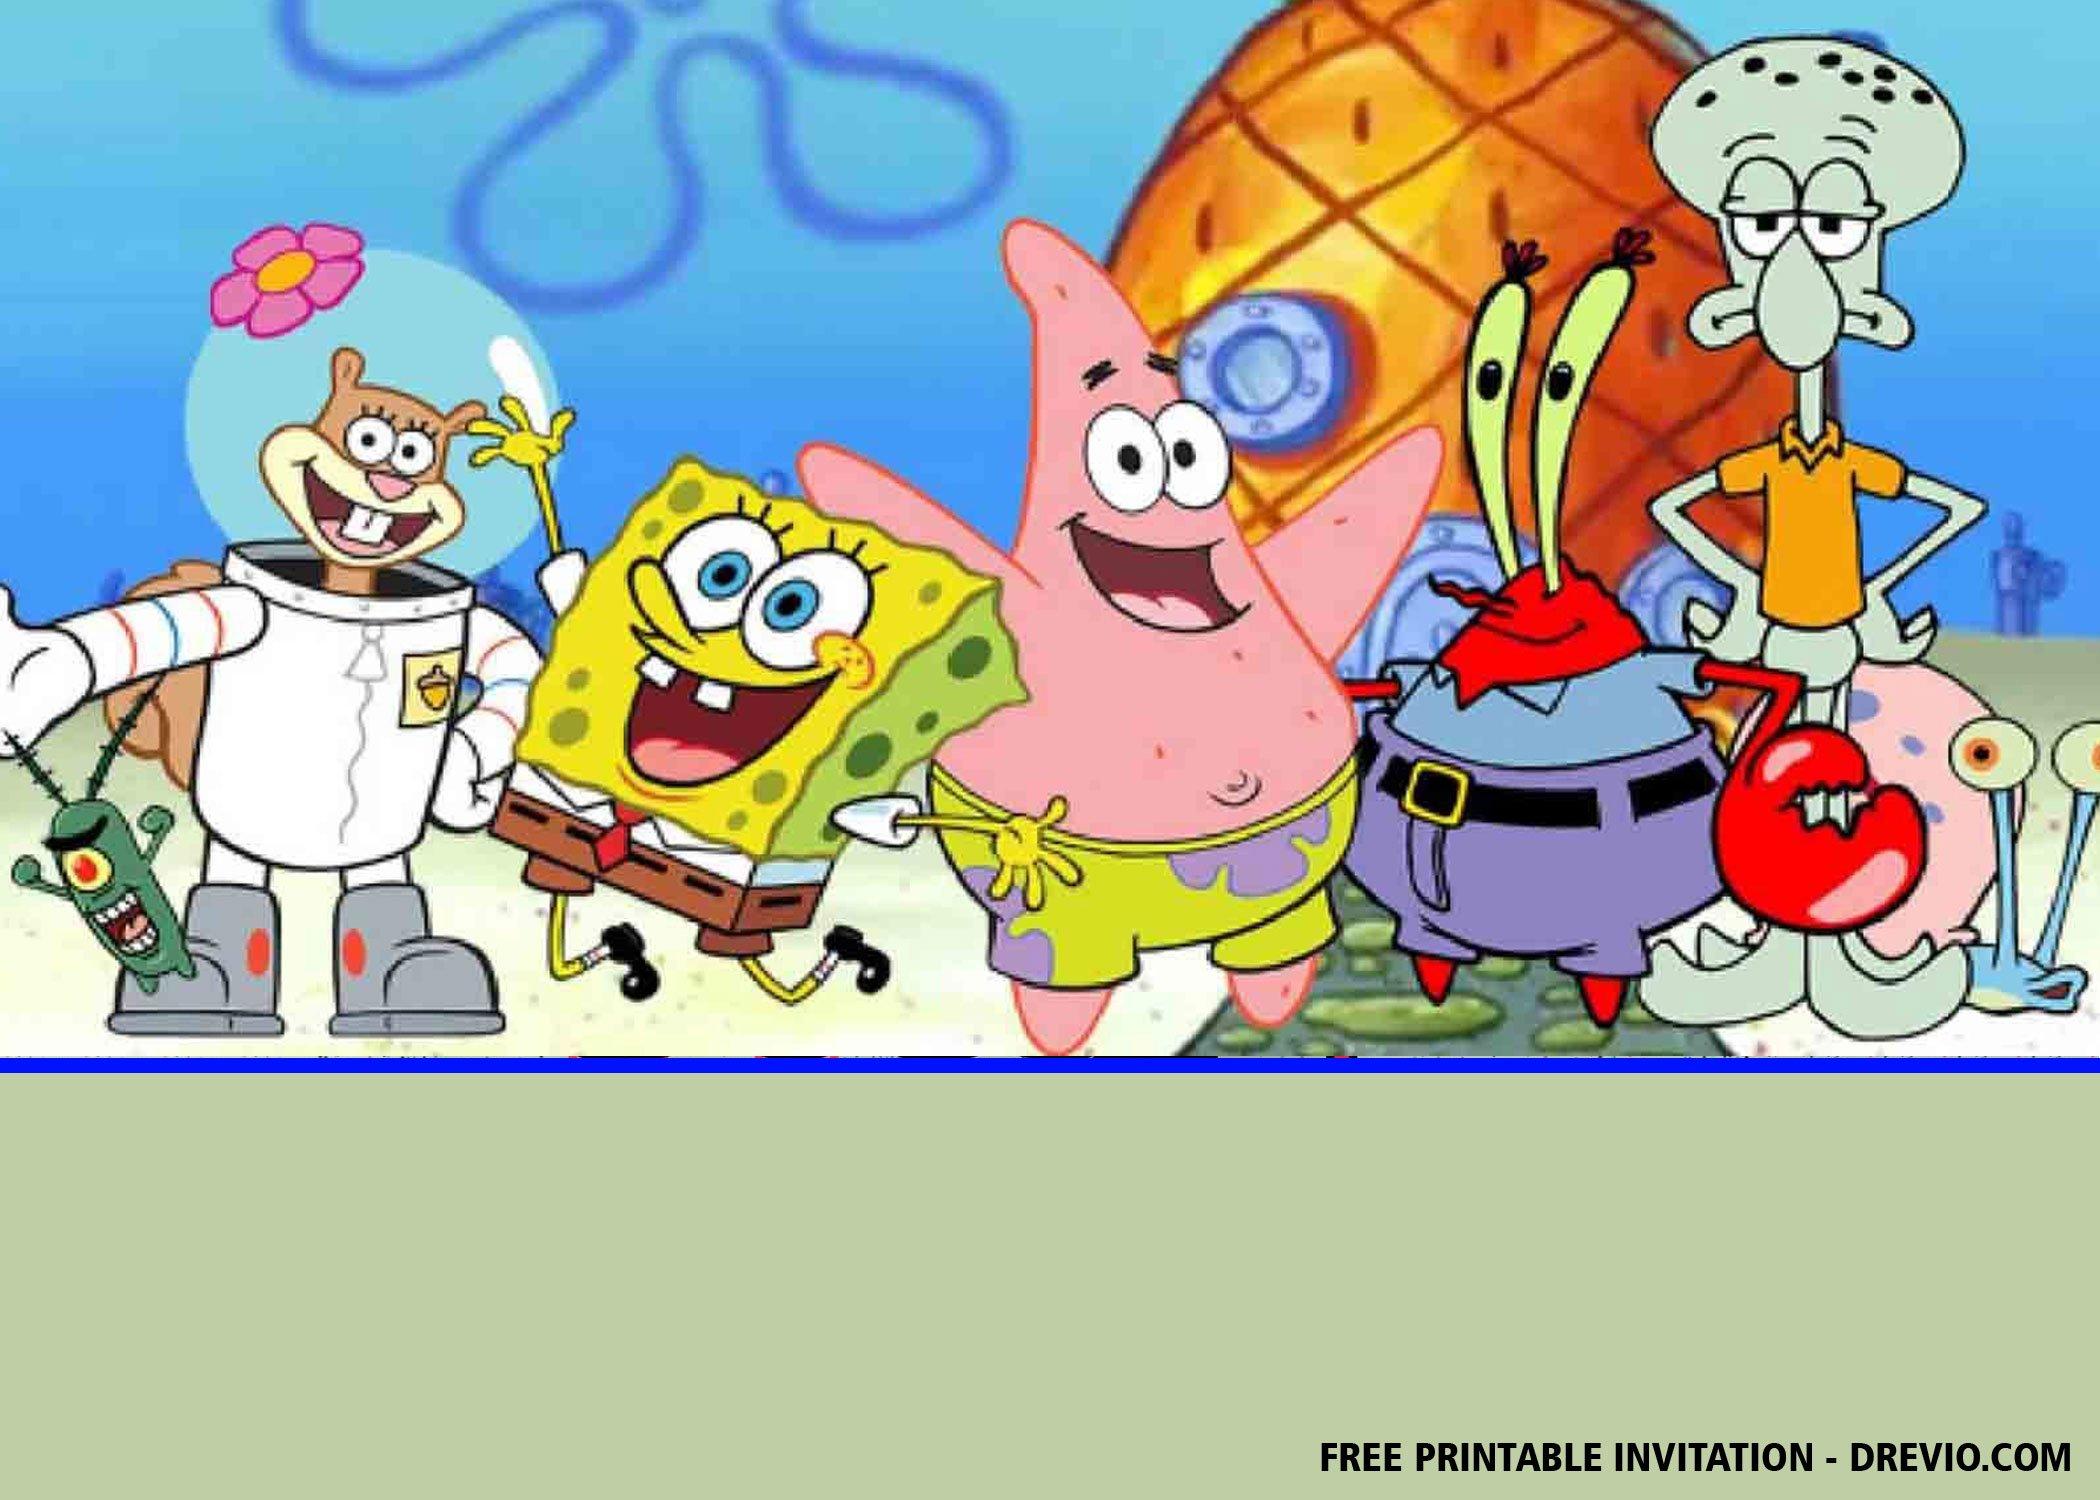 Free Spongebob Squarepants Invitation Templates